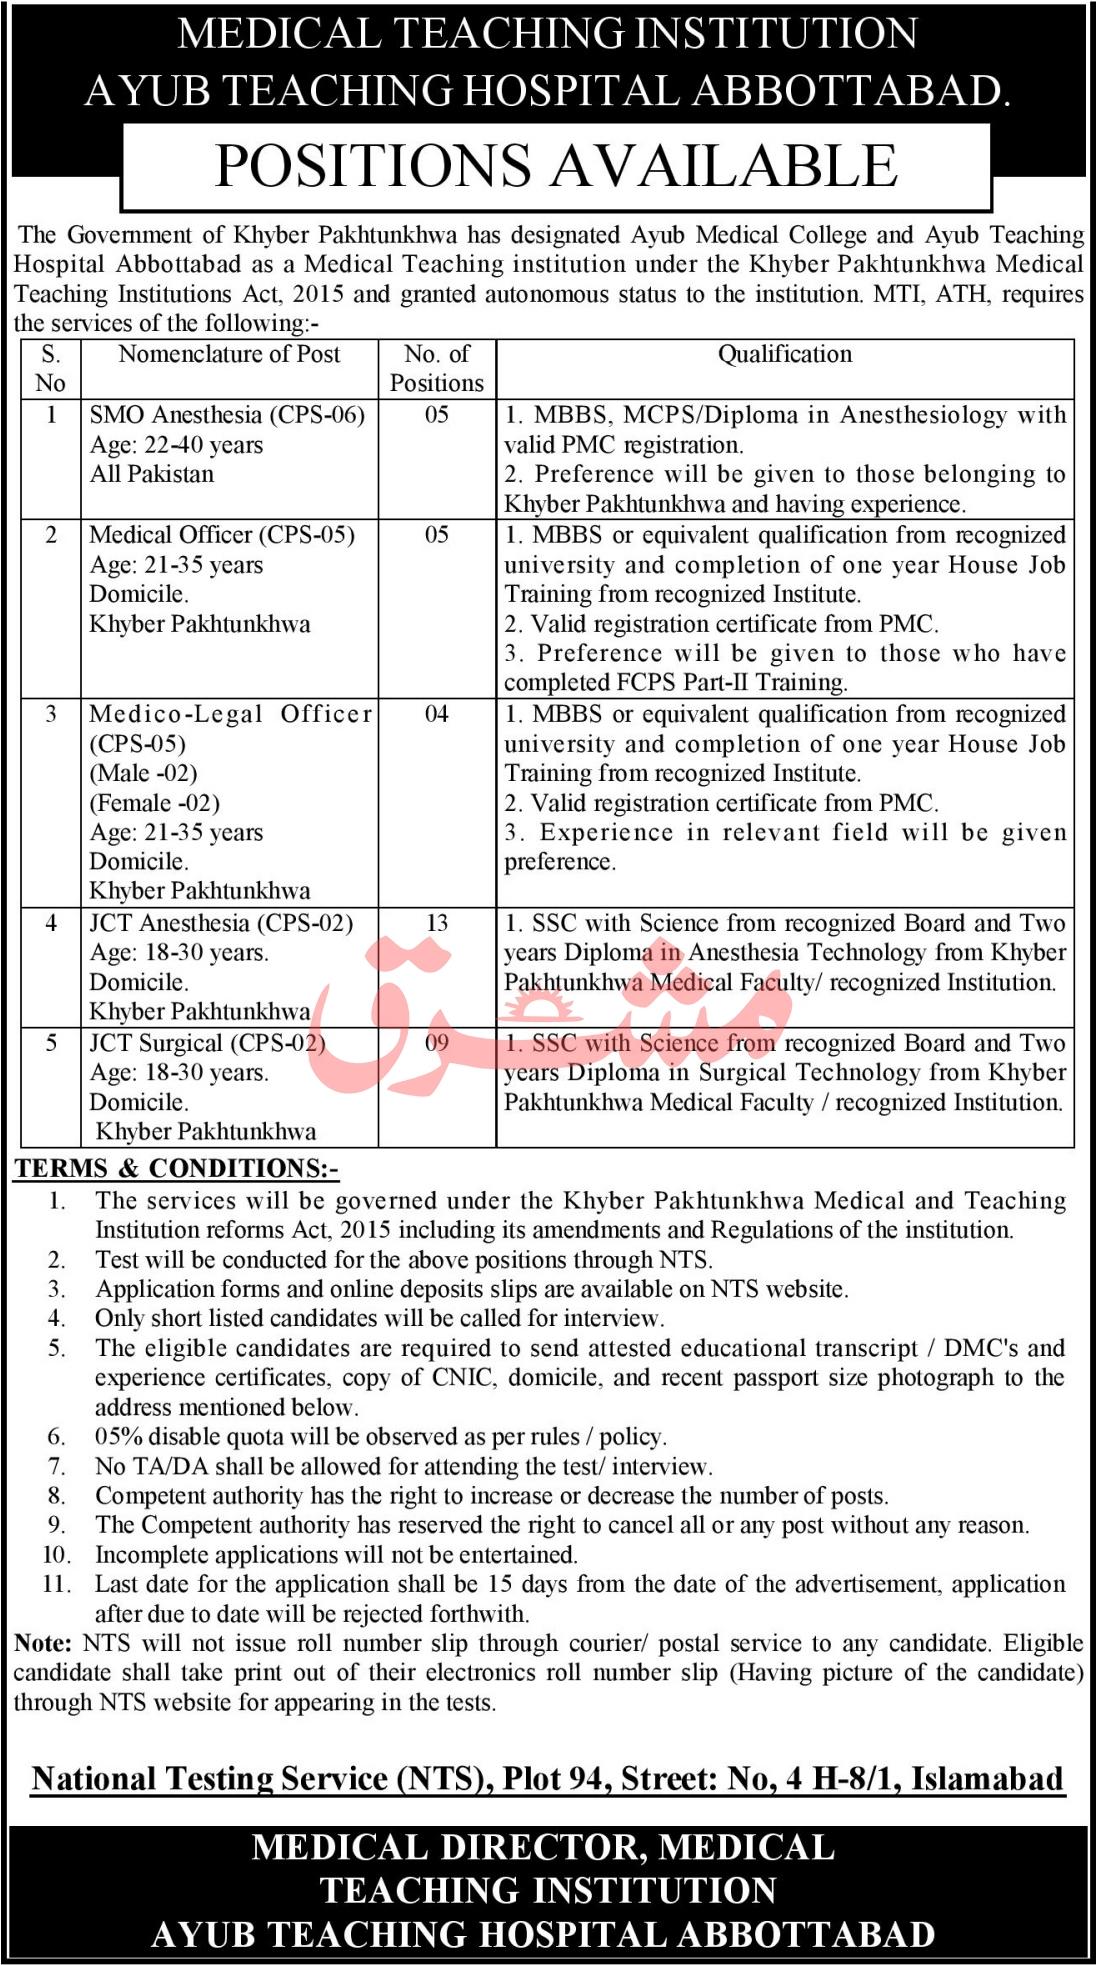 ATH Ayub Teaching Hospital Abbottabad 13th June 2021 NTS Test Result